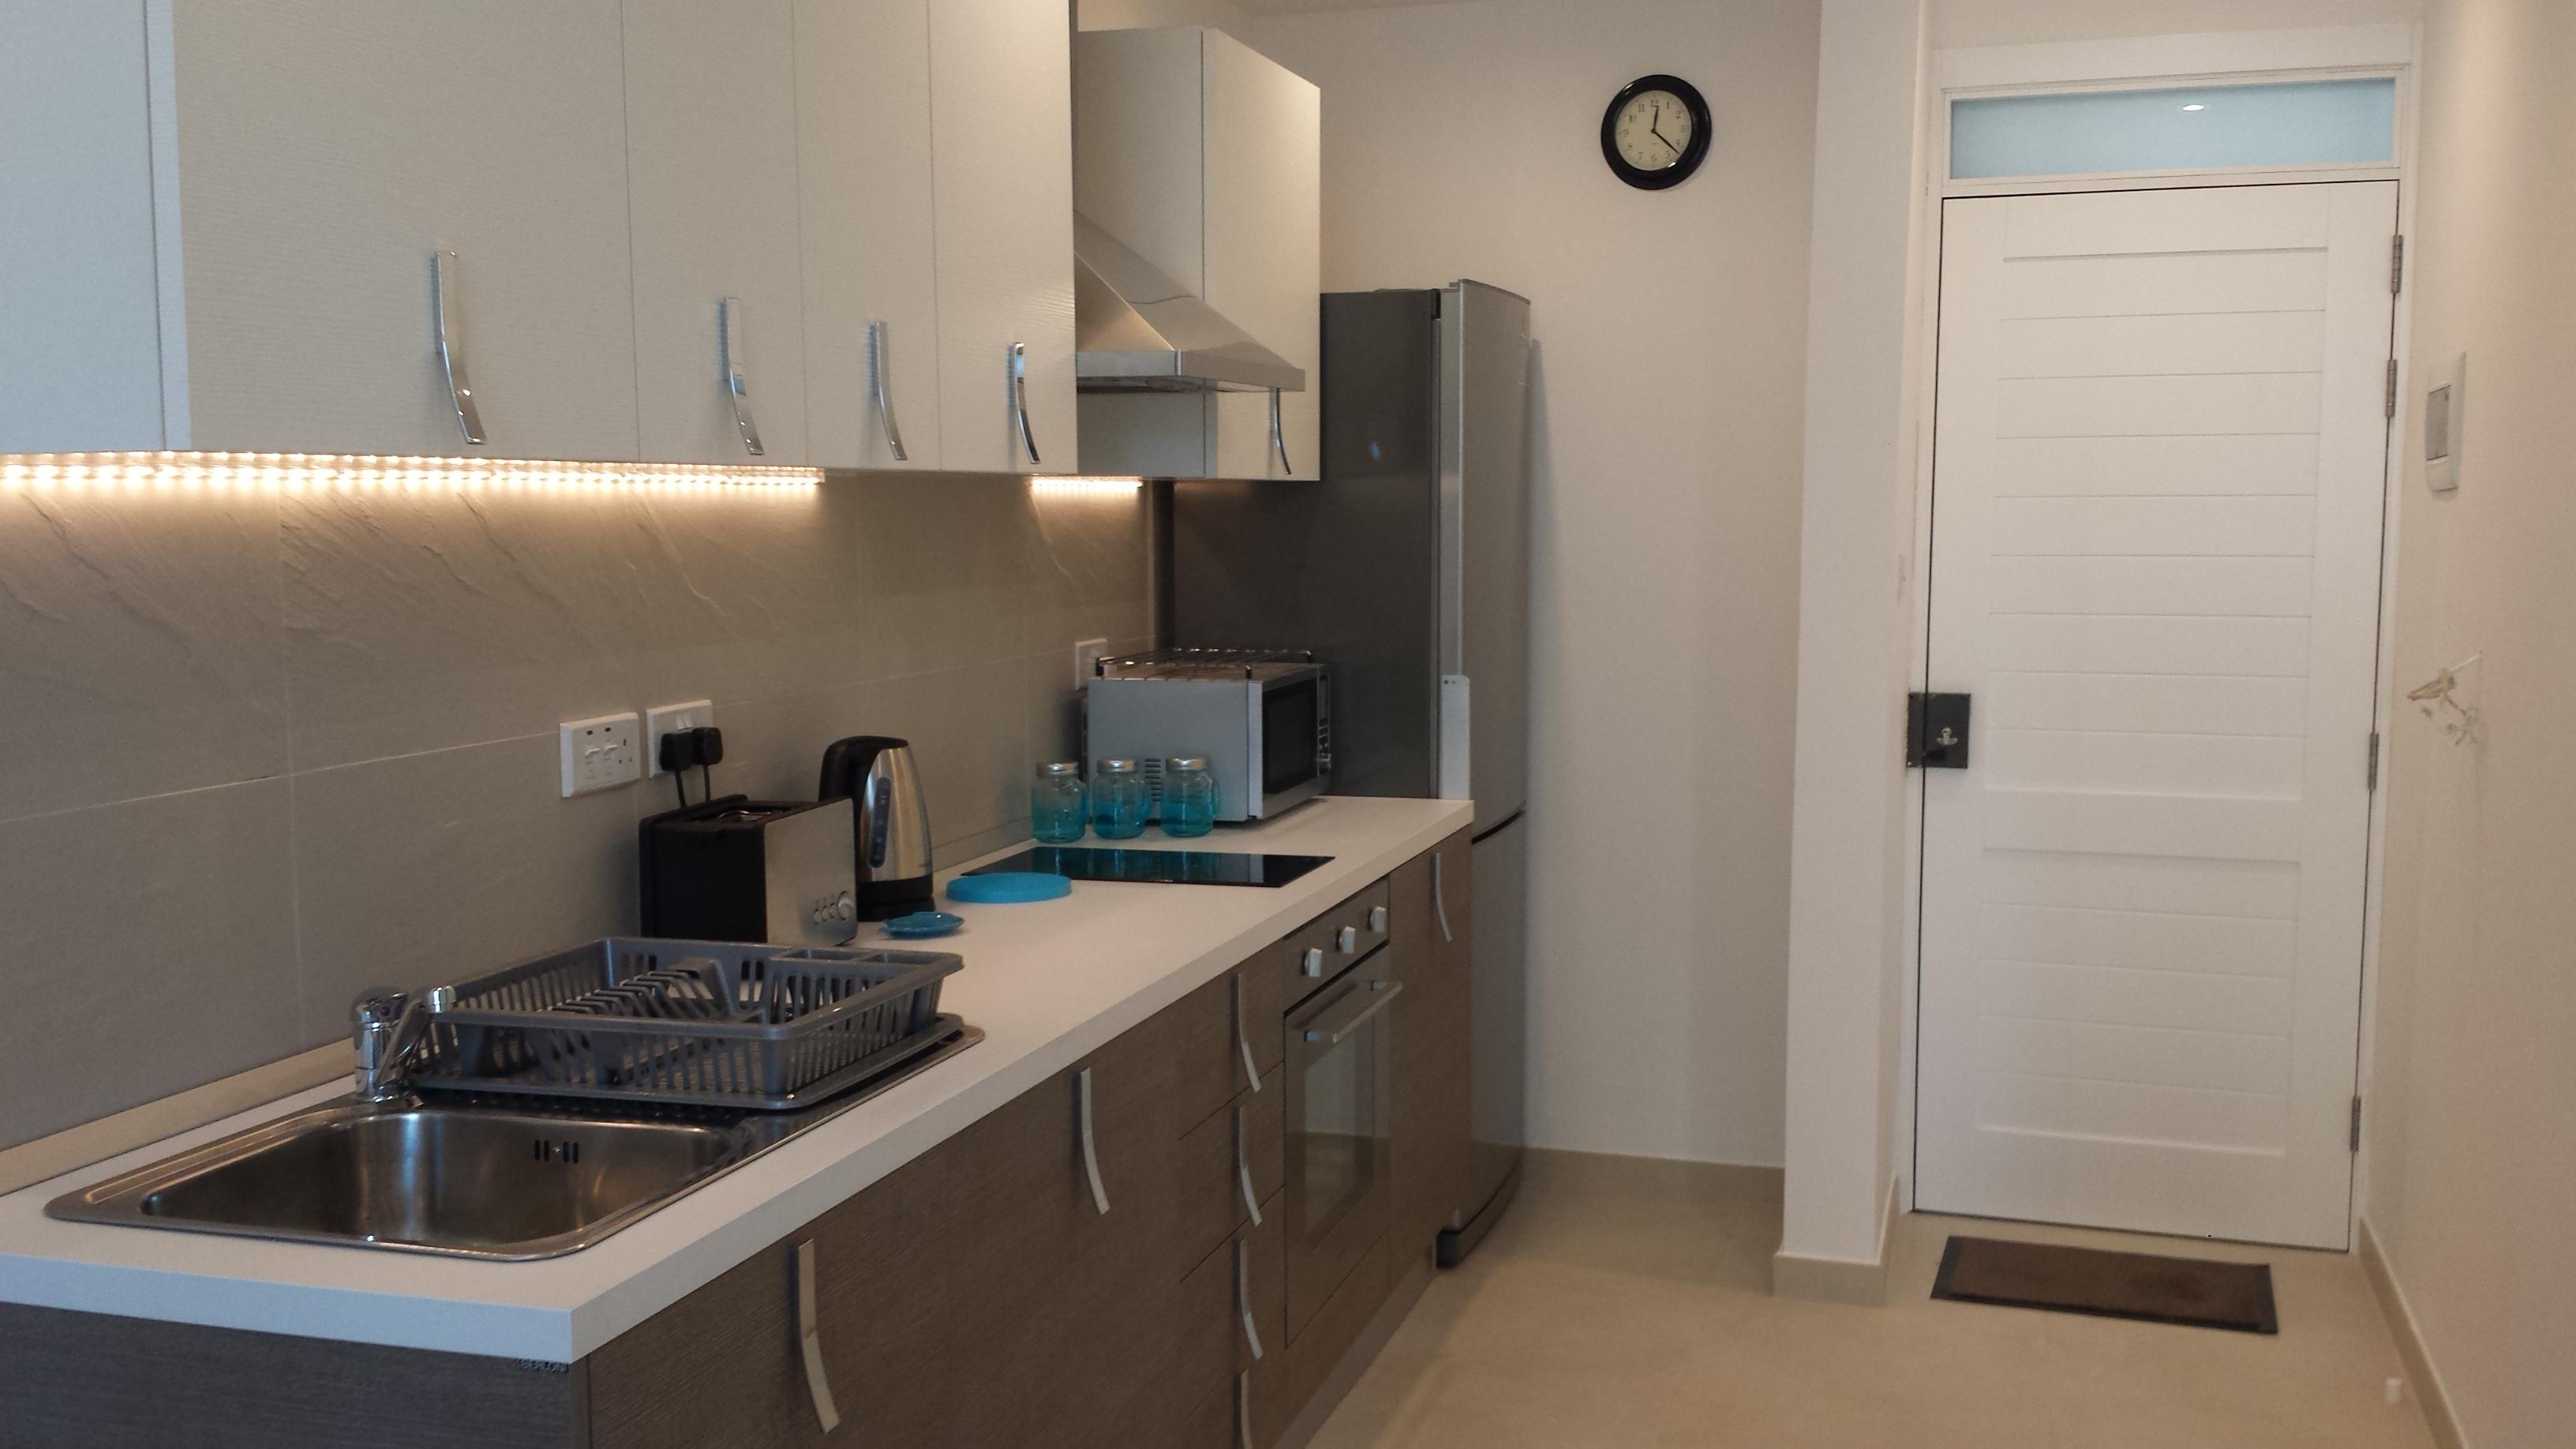 2-Bed Apartment in Paceville, St Julians, Malta